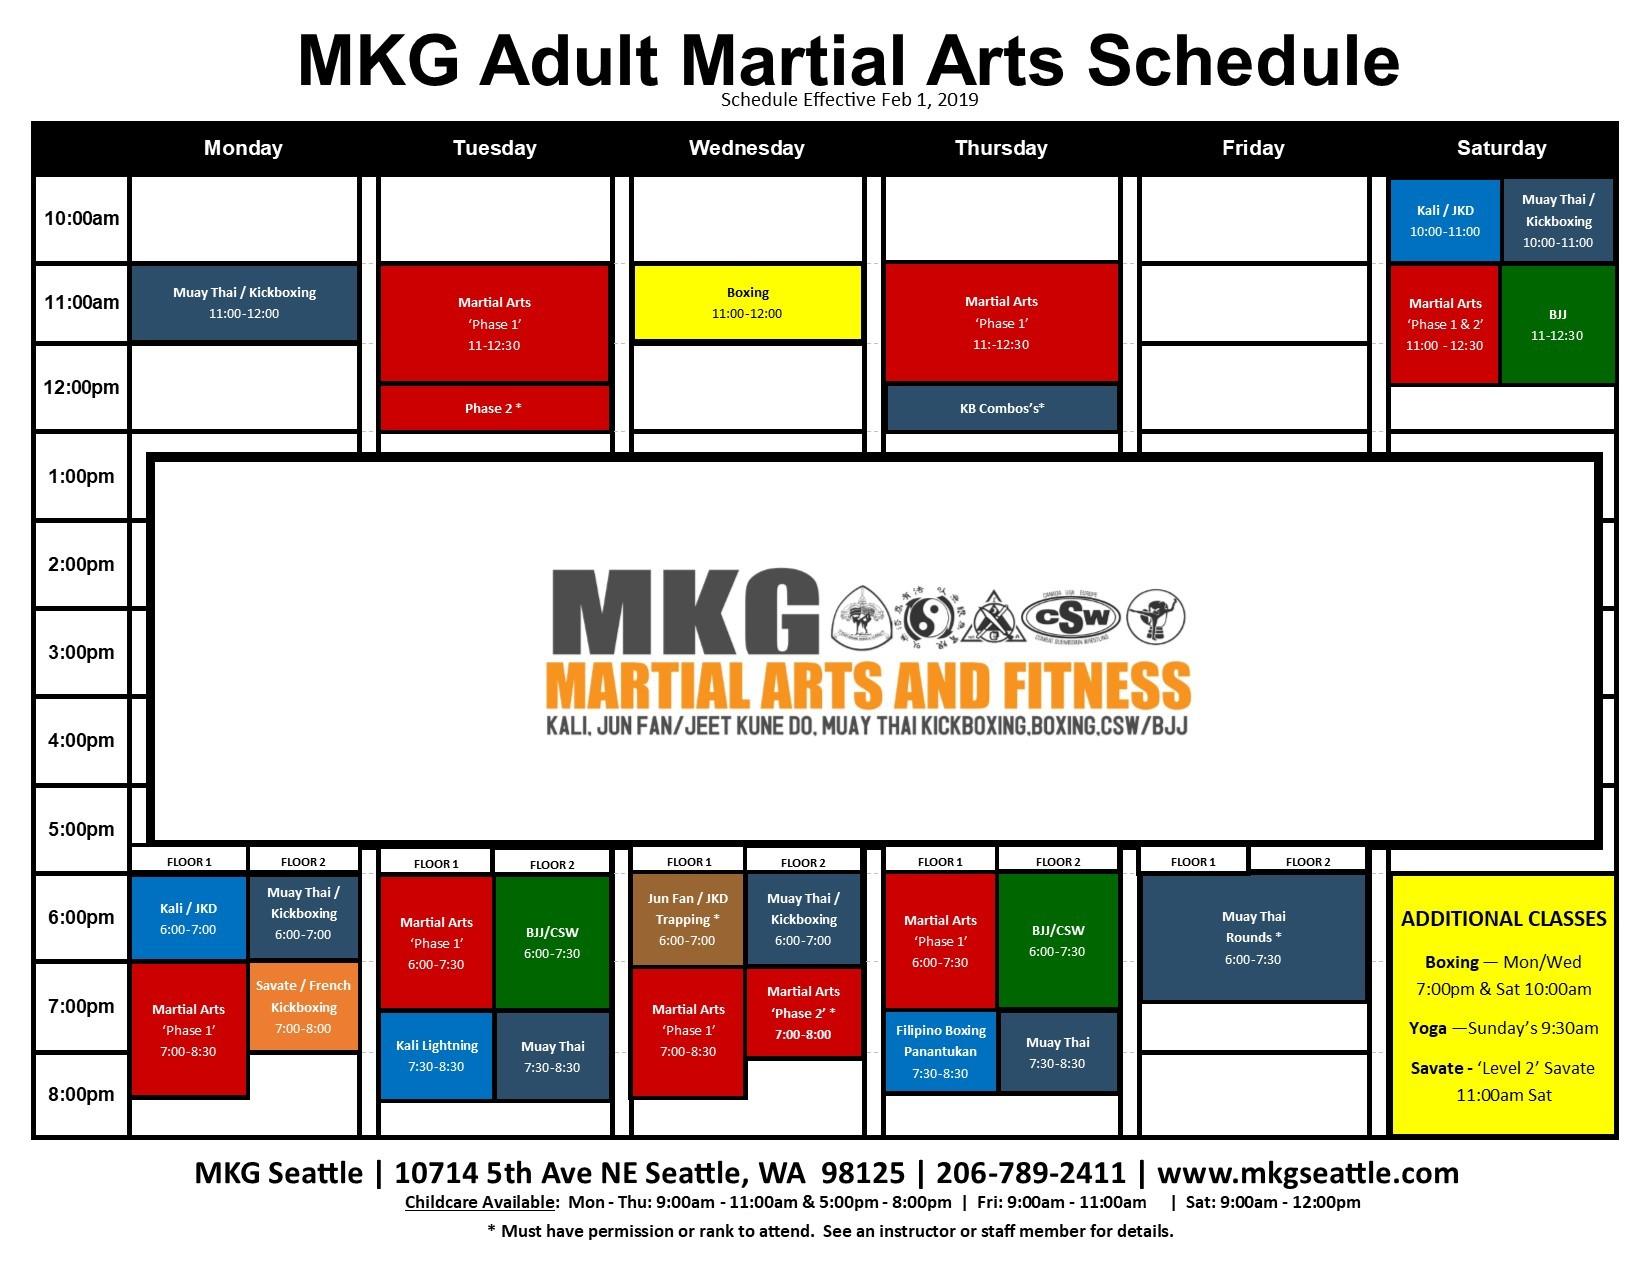 MKG Seattle Class Schedule | Martial Arts